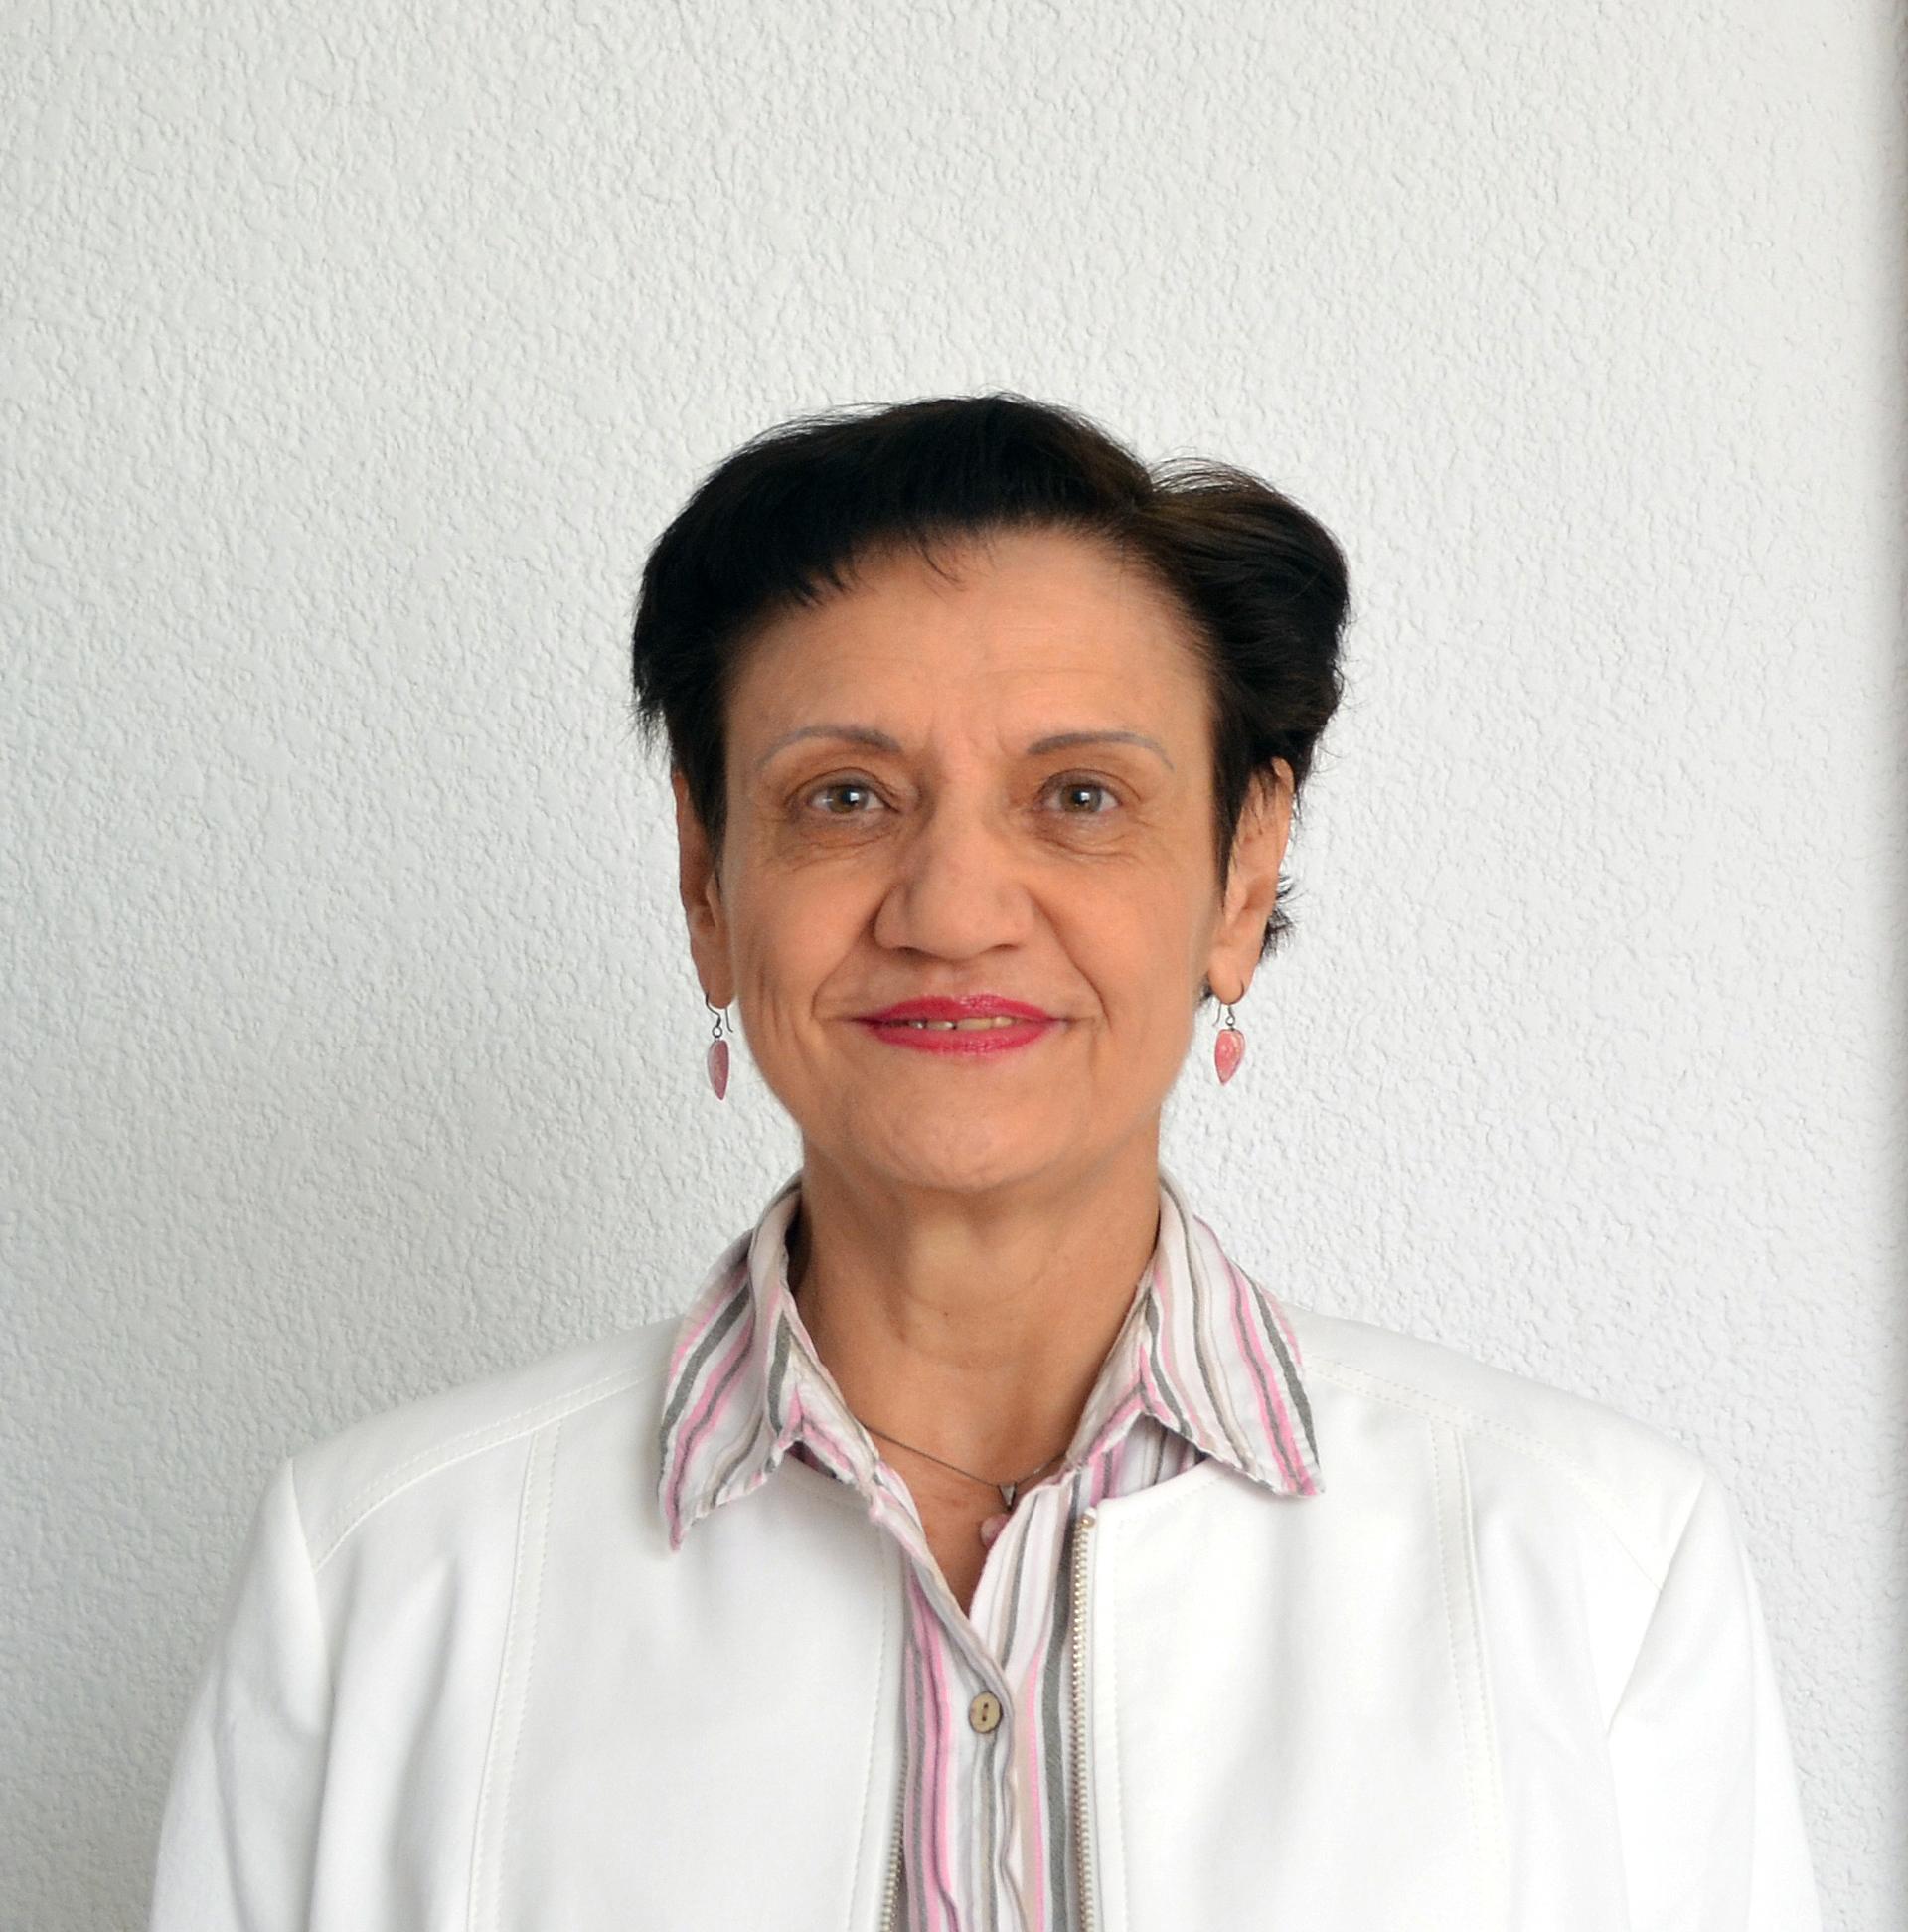 Directora General, Dra. María Emilia Alejandra Janetti Díaz